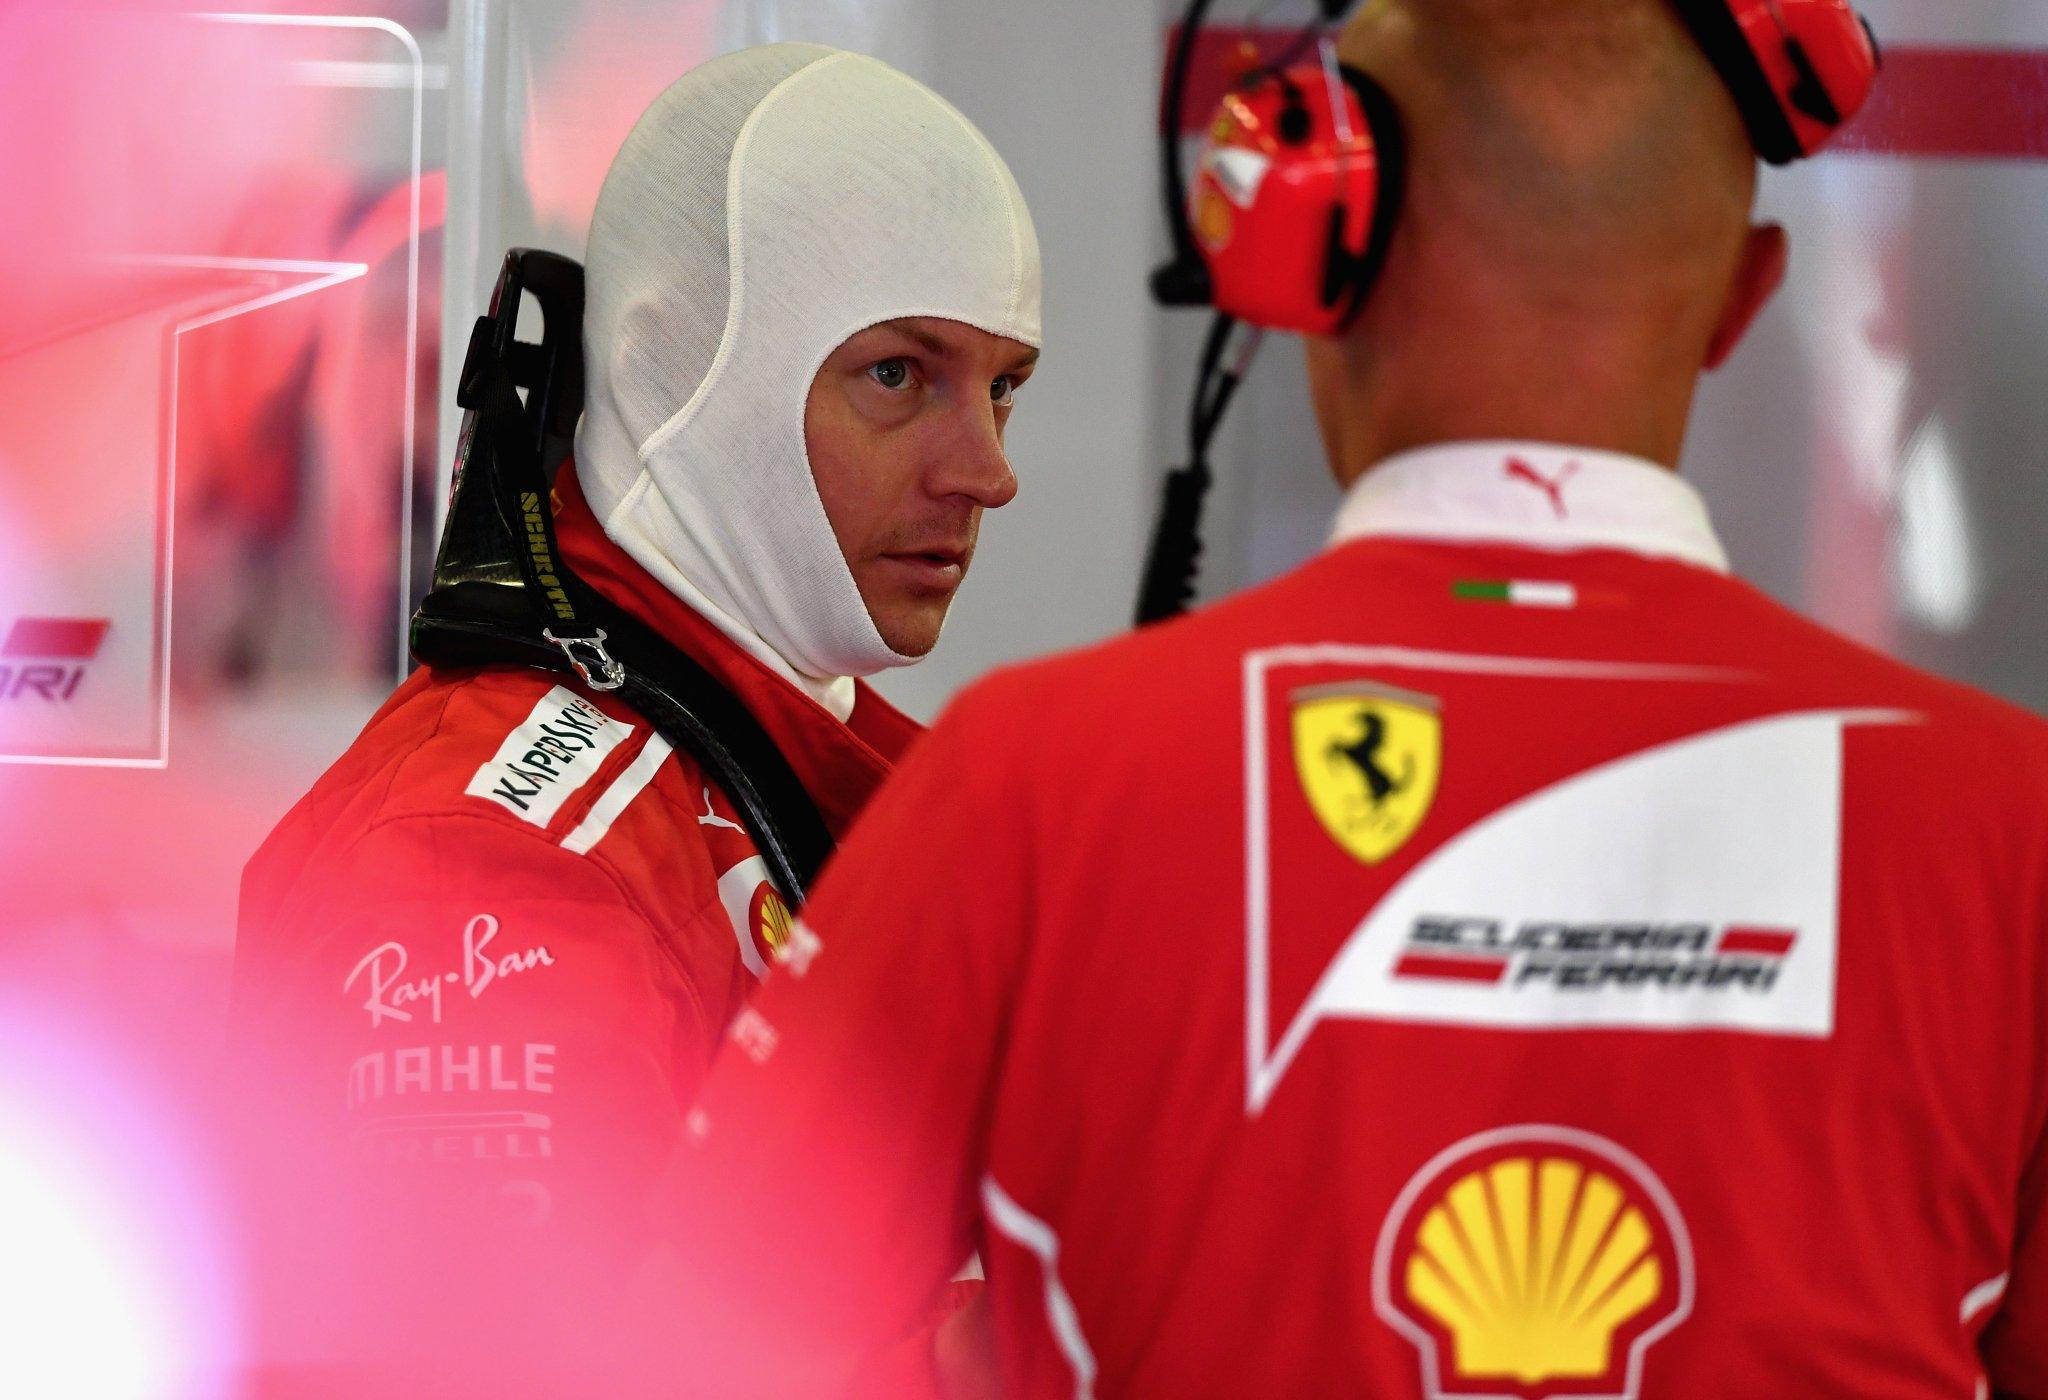 Räikkönen: We had a very good result